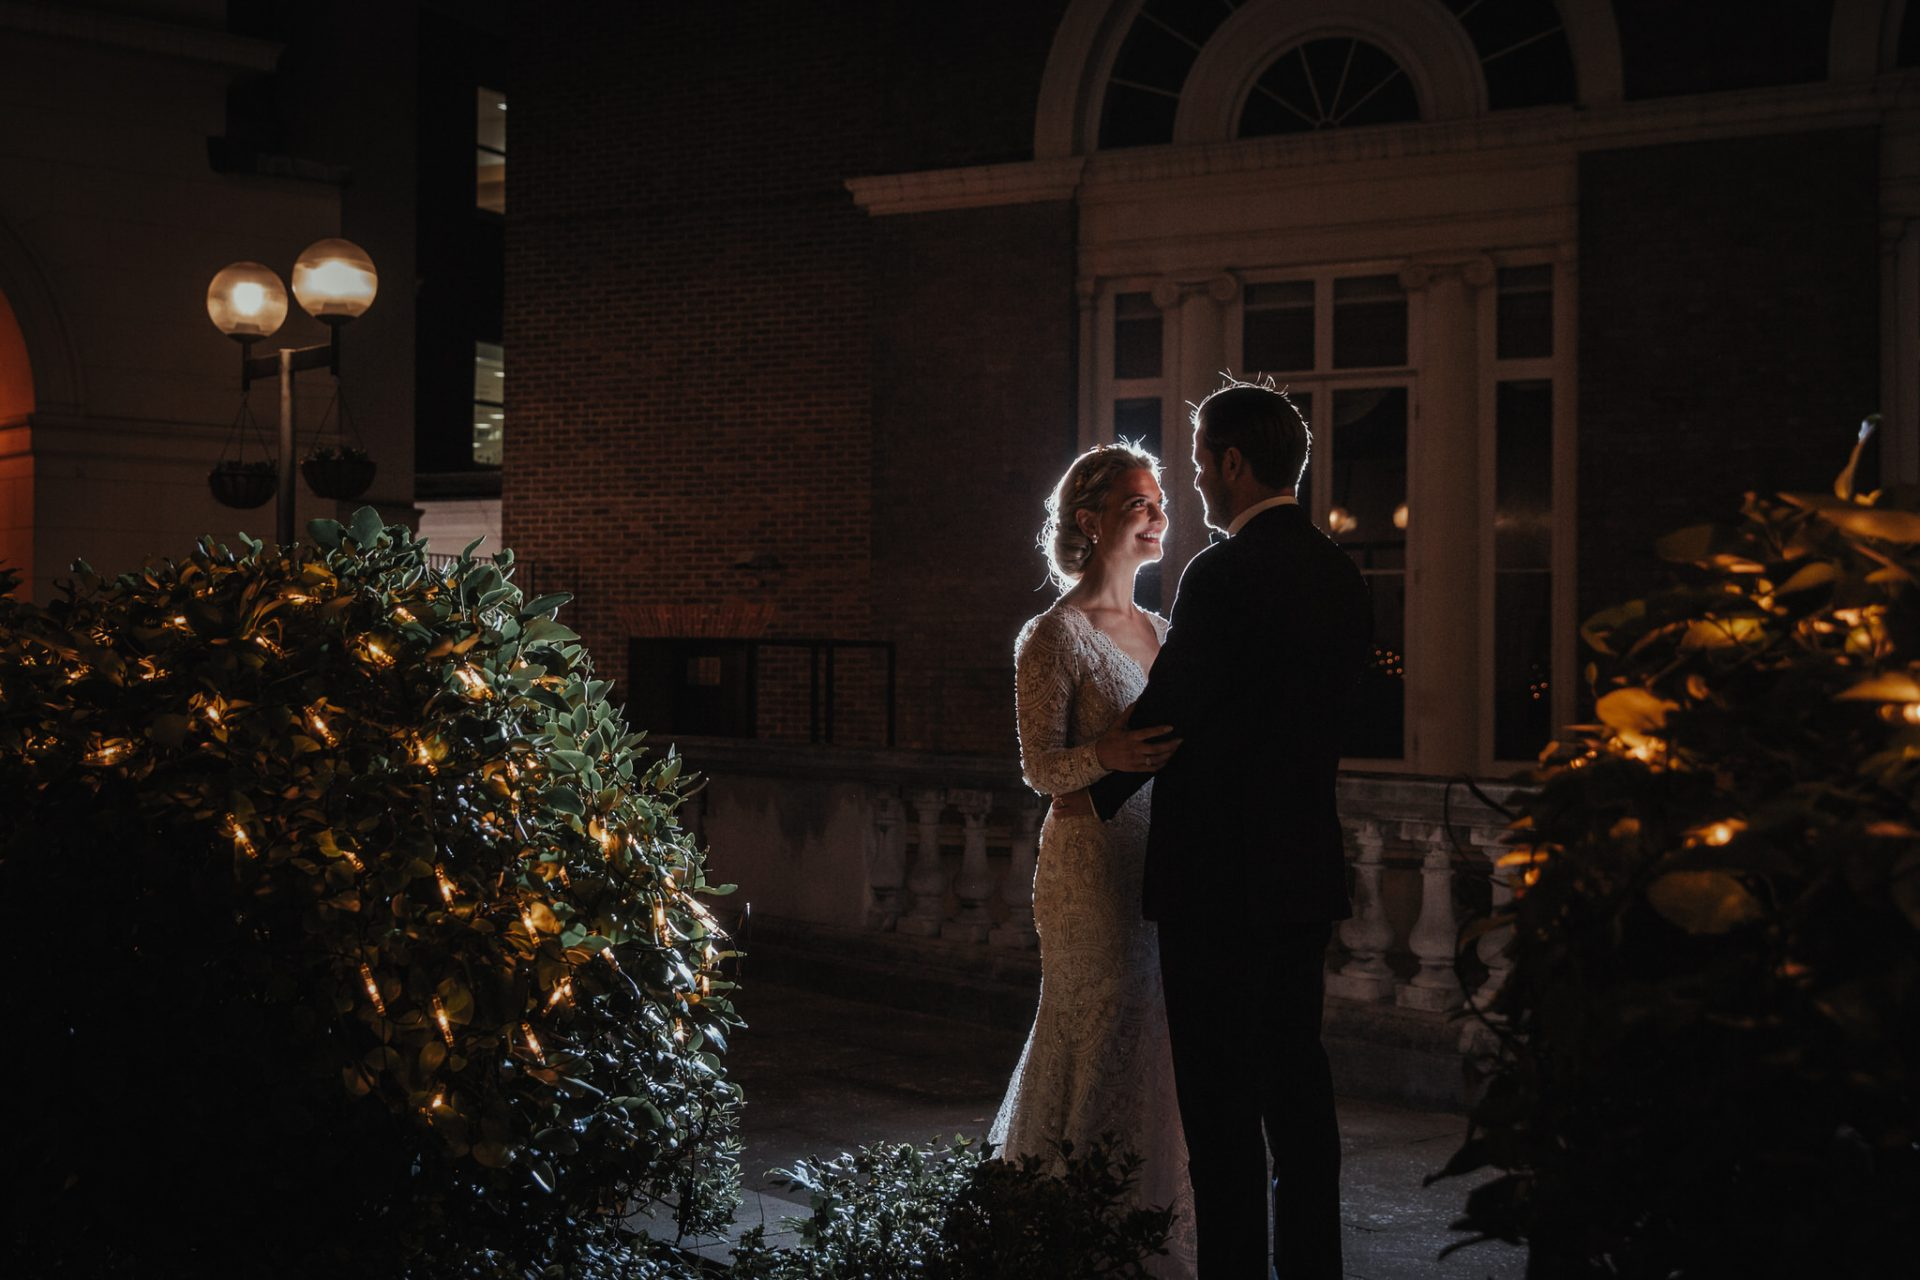 Gibson-hall wedding-photography-Chris-Woodman-photography-02